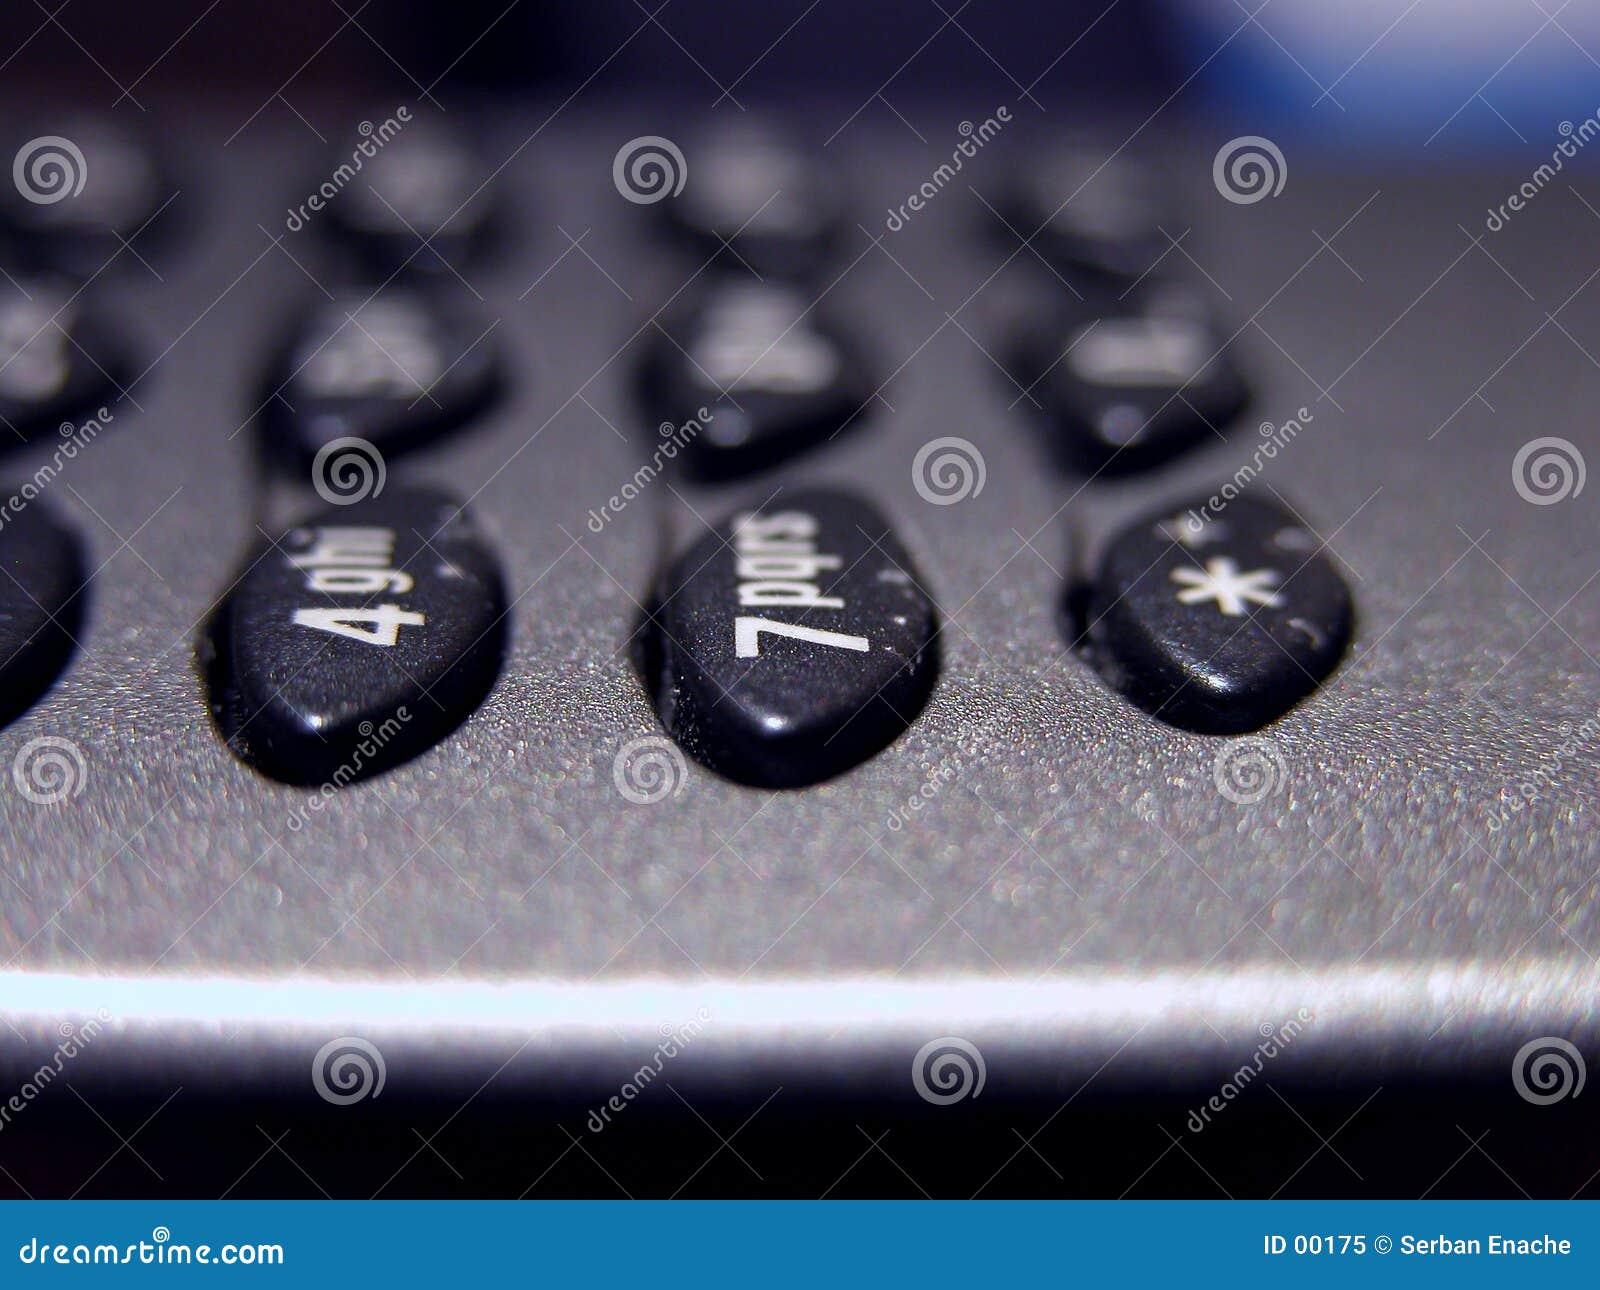 Teléfono móvil - detalle